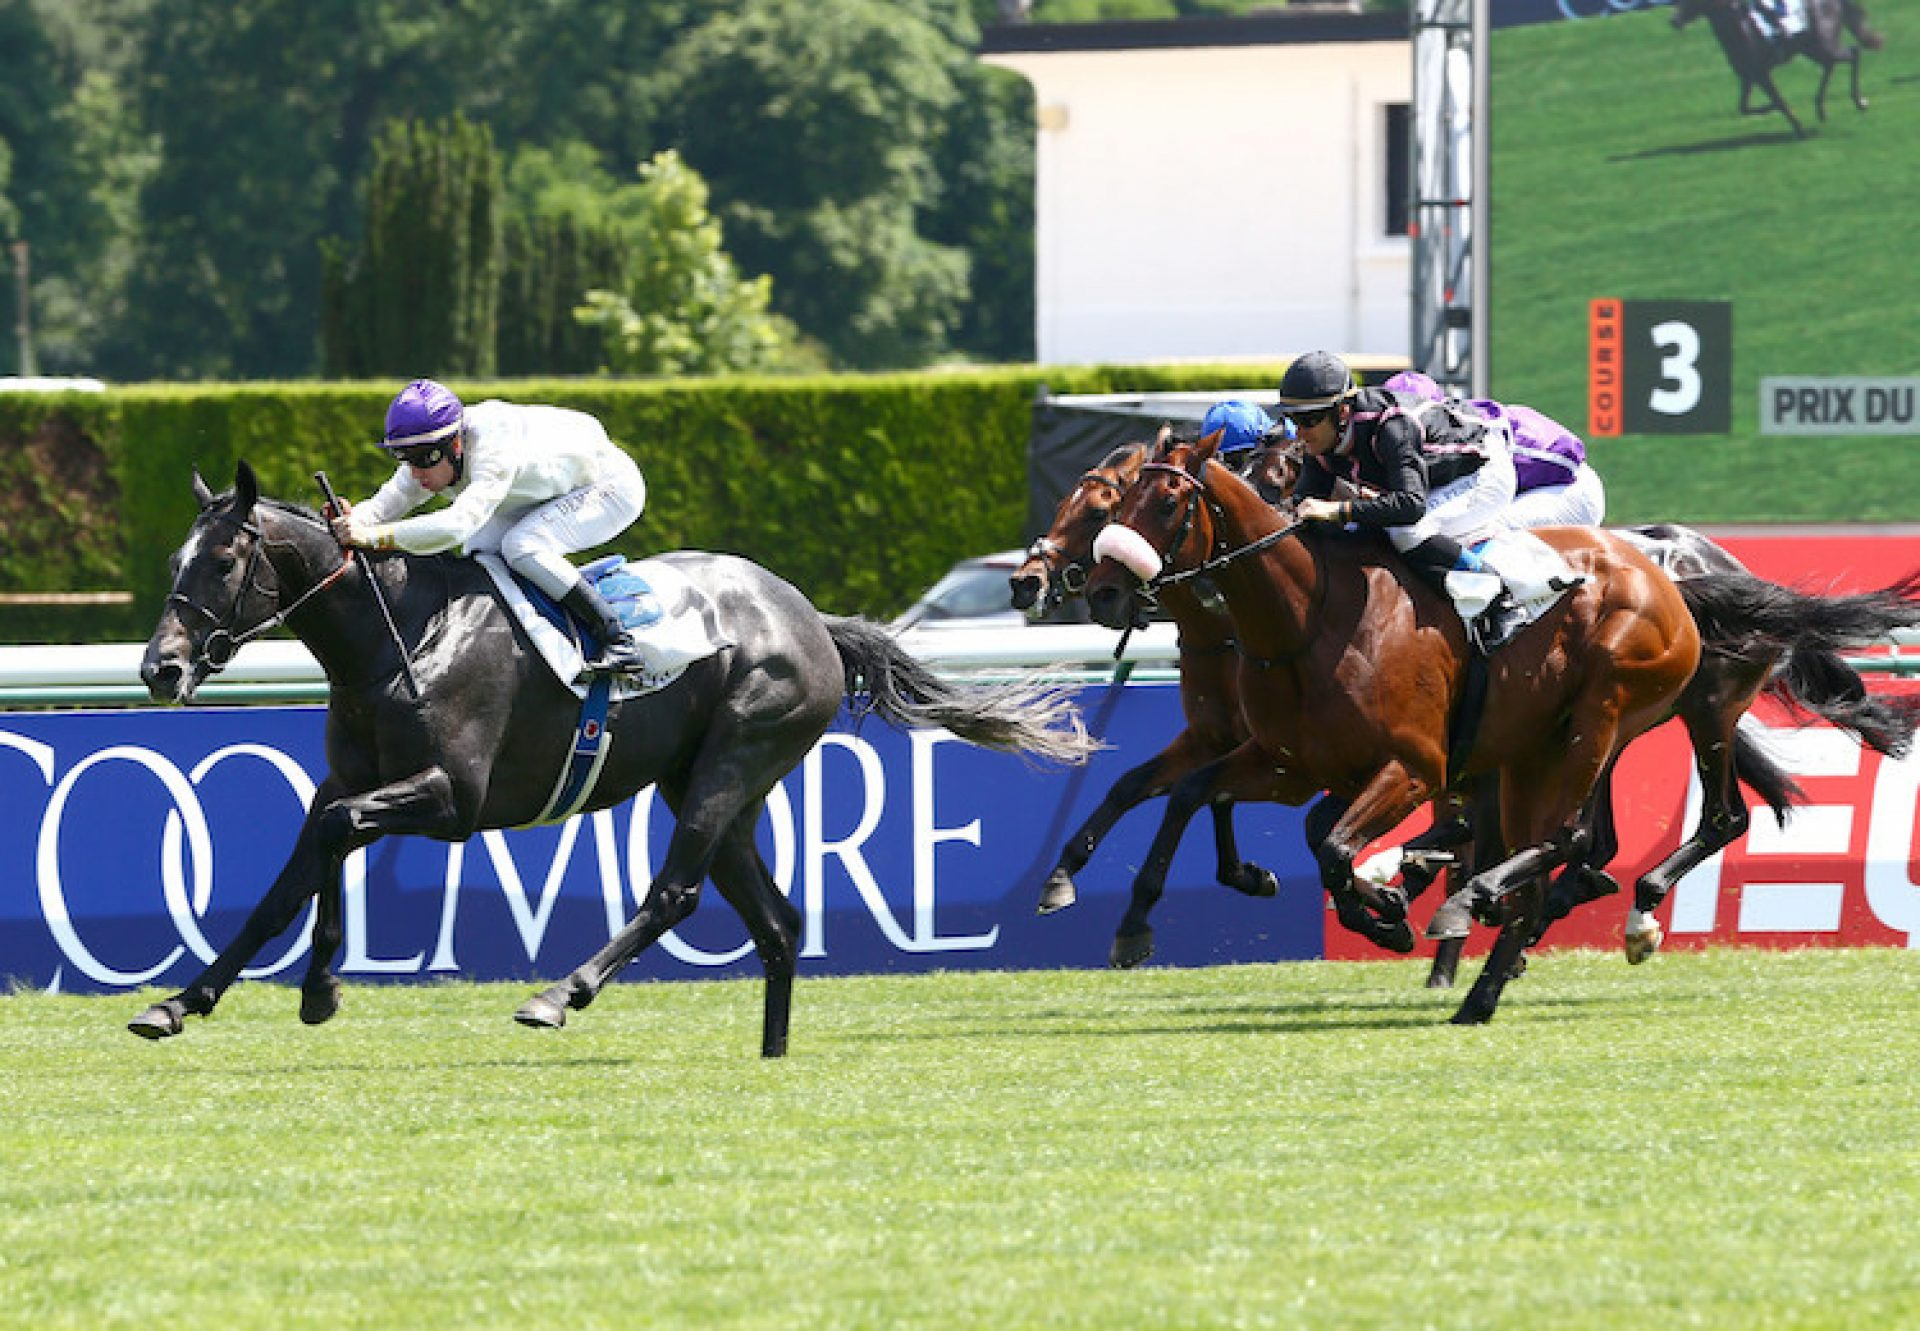 Neufbosc (Fastnet Rock) winning the G3 Prix du Lys at Longchamp